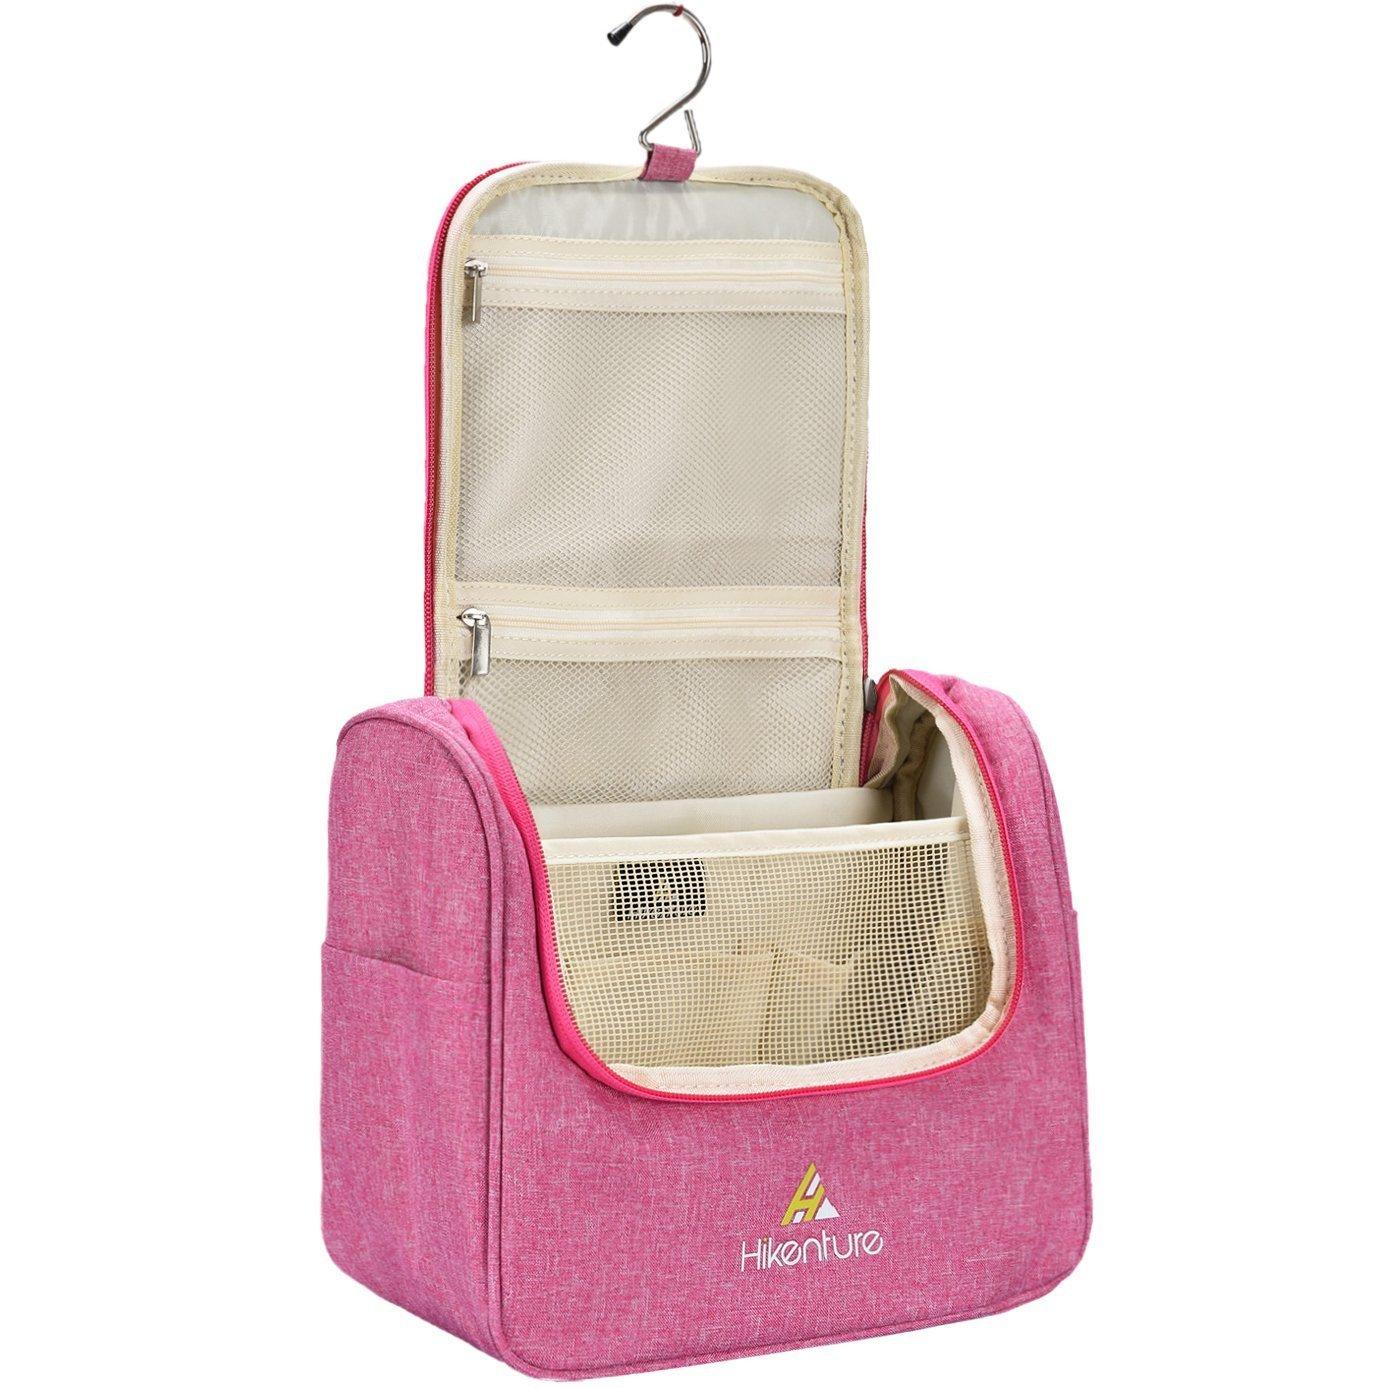 Hikenture Travel Bag Organizer | Toiletry Bag for Men&Women | Portable,Waterproof Dopp Kit | TSA Friendly Hanging Toiletry Bag for Home, Gym, Airplane, Hotel, Car Use (Pink)